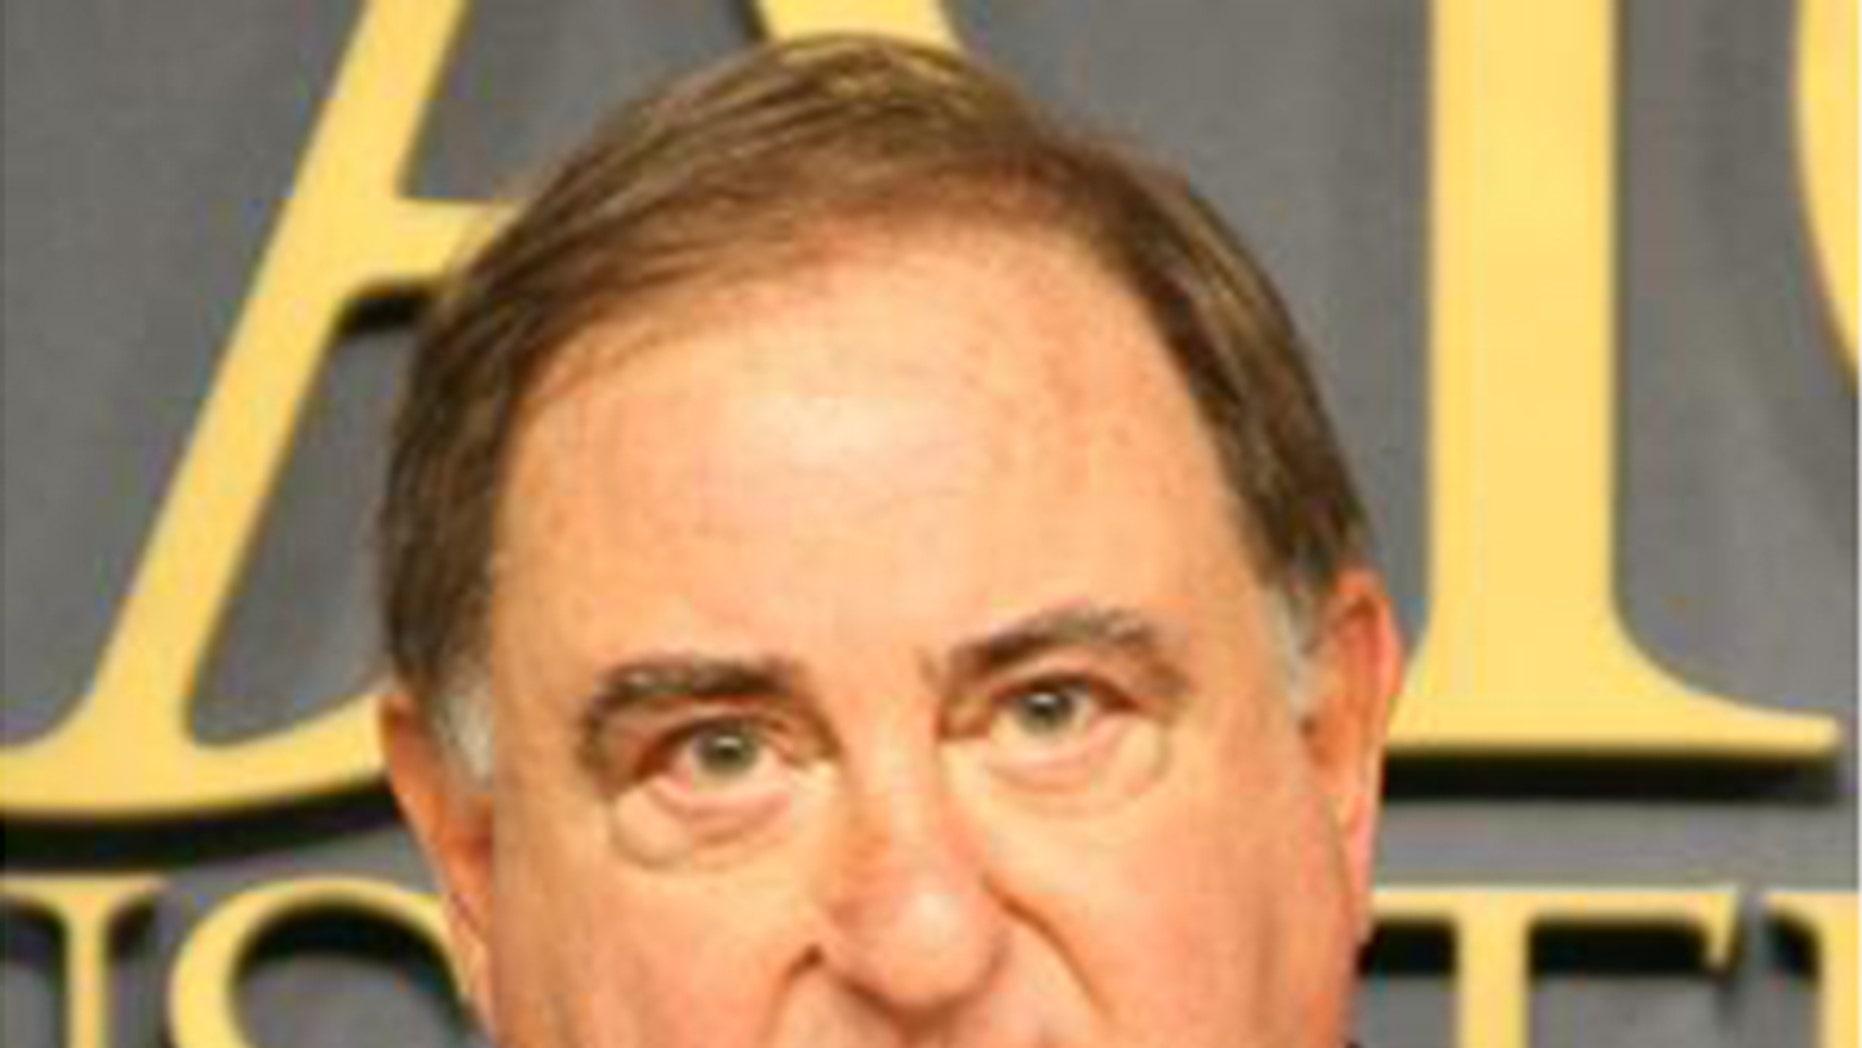 Professor Stefan Halper is at the center of a Pentagon whisteblower complaint, documents show.